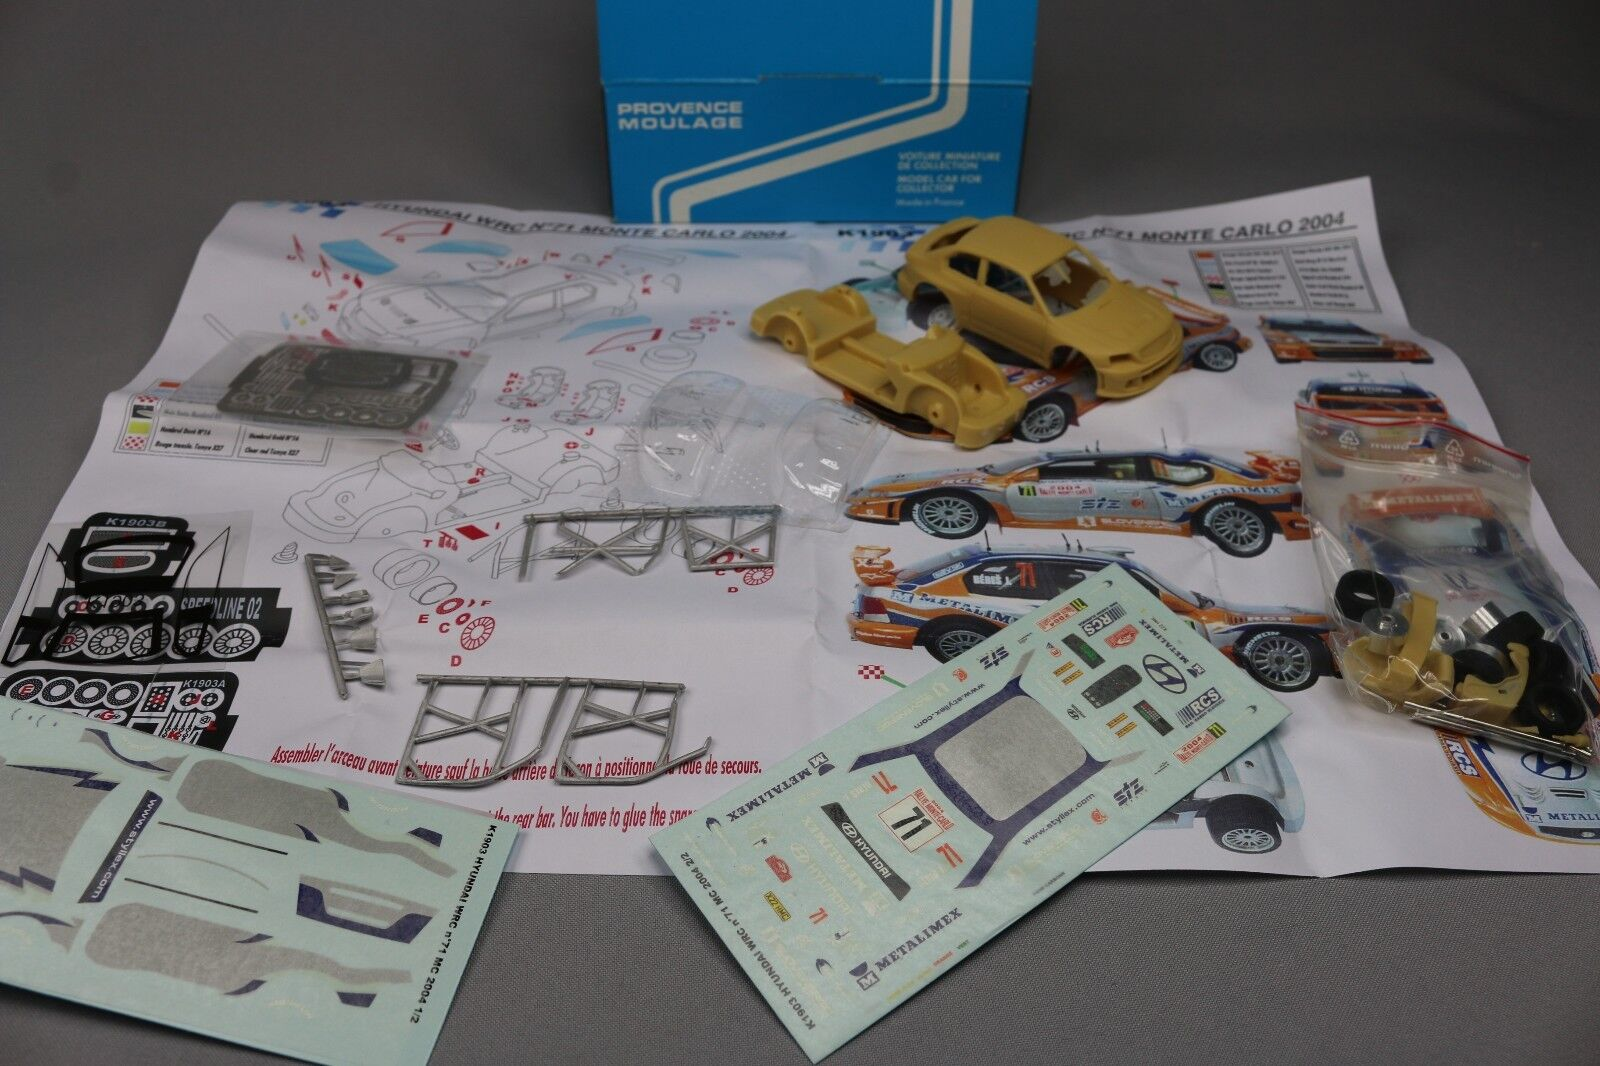 ZC569 Provence Moulage K1903 Kit Vehicule 1 43 Hyundai WRC N°71 Monte Cochelo 2004